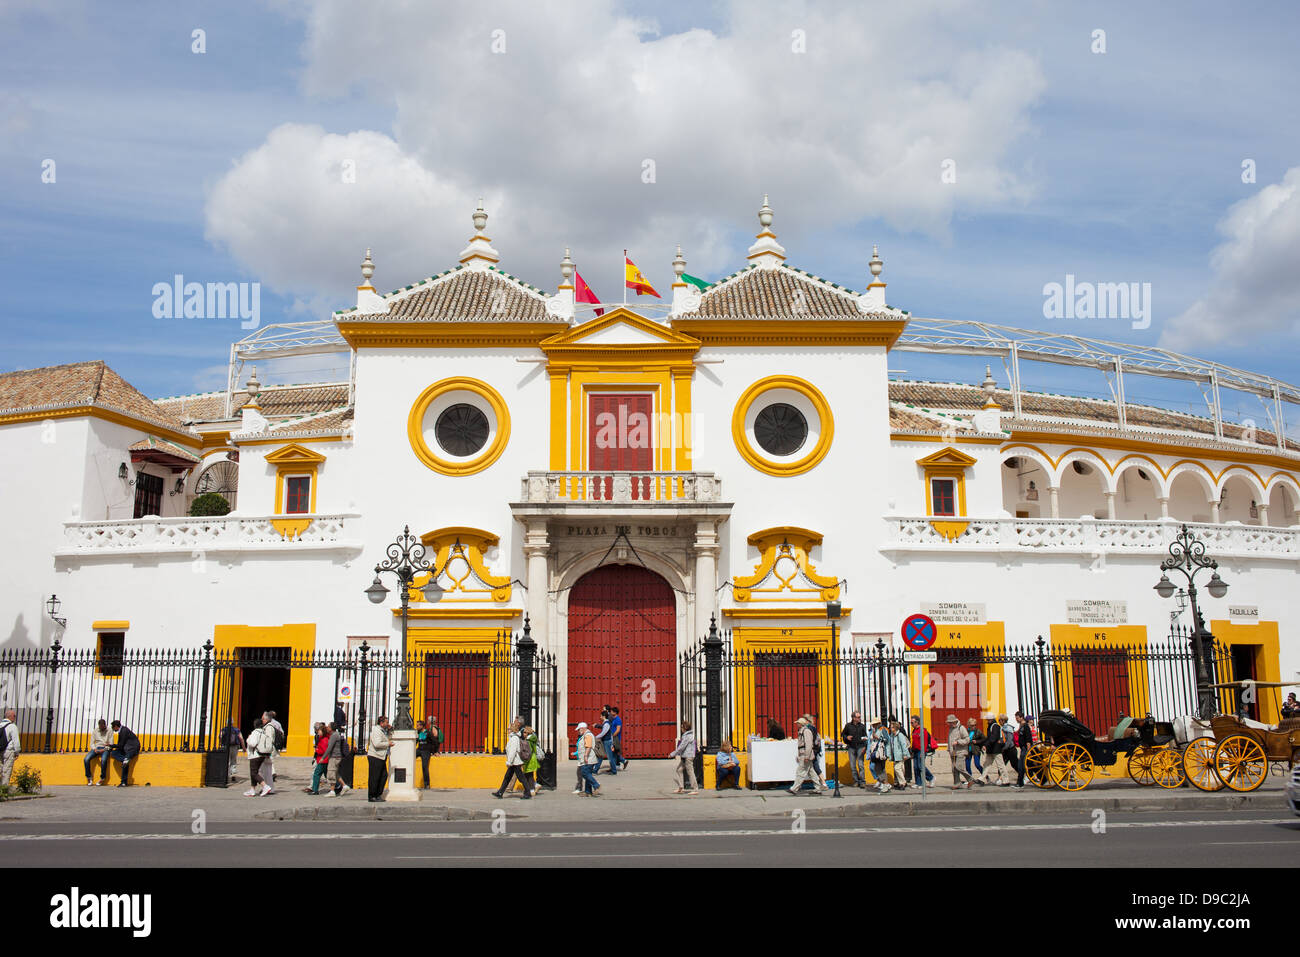 Bullring in Seville (Spanish: Plaza de Toros de la Real Maestranza de Caballeria de Sevilla), Andalusia, Spain. - Stock Image